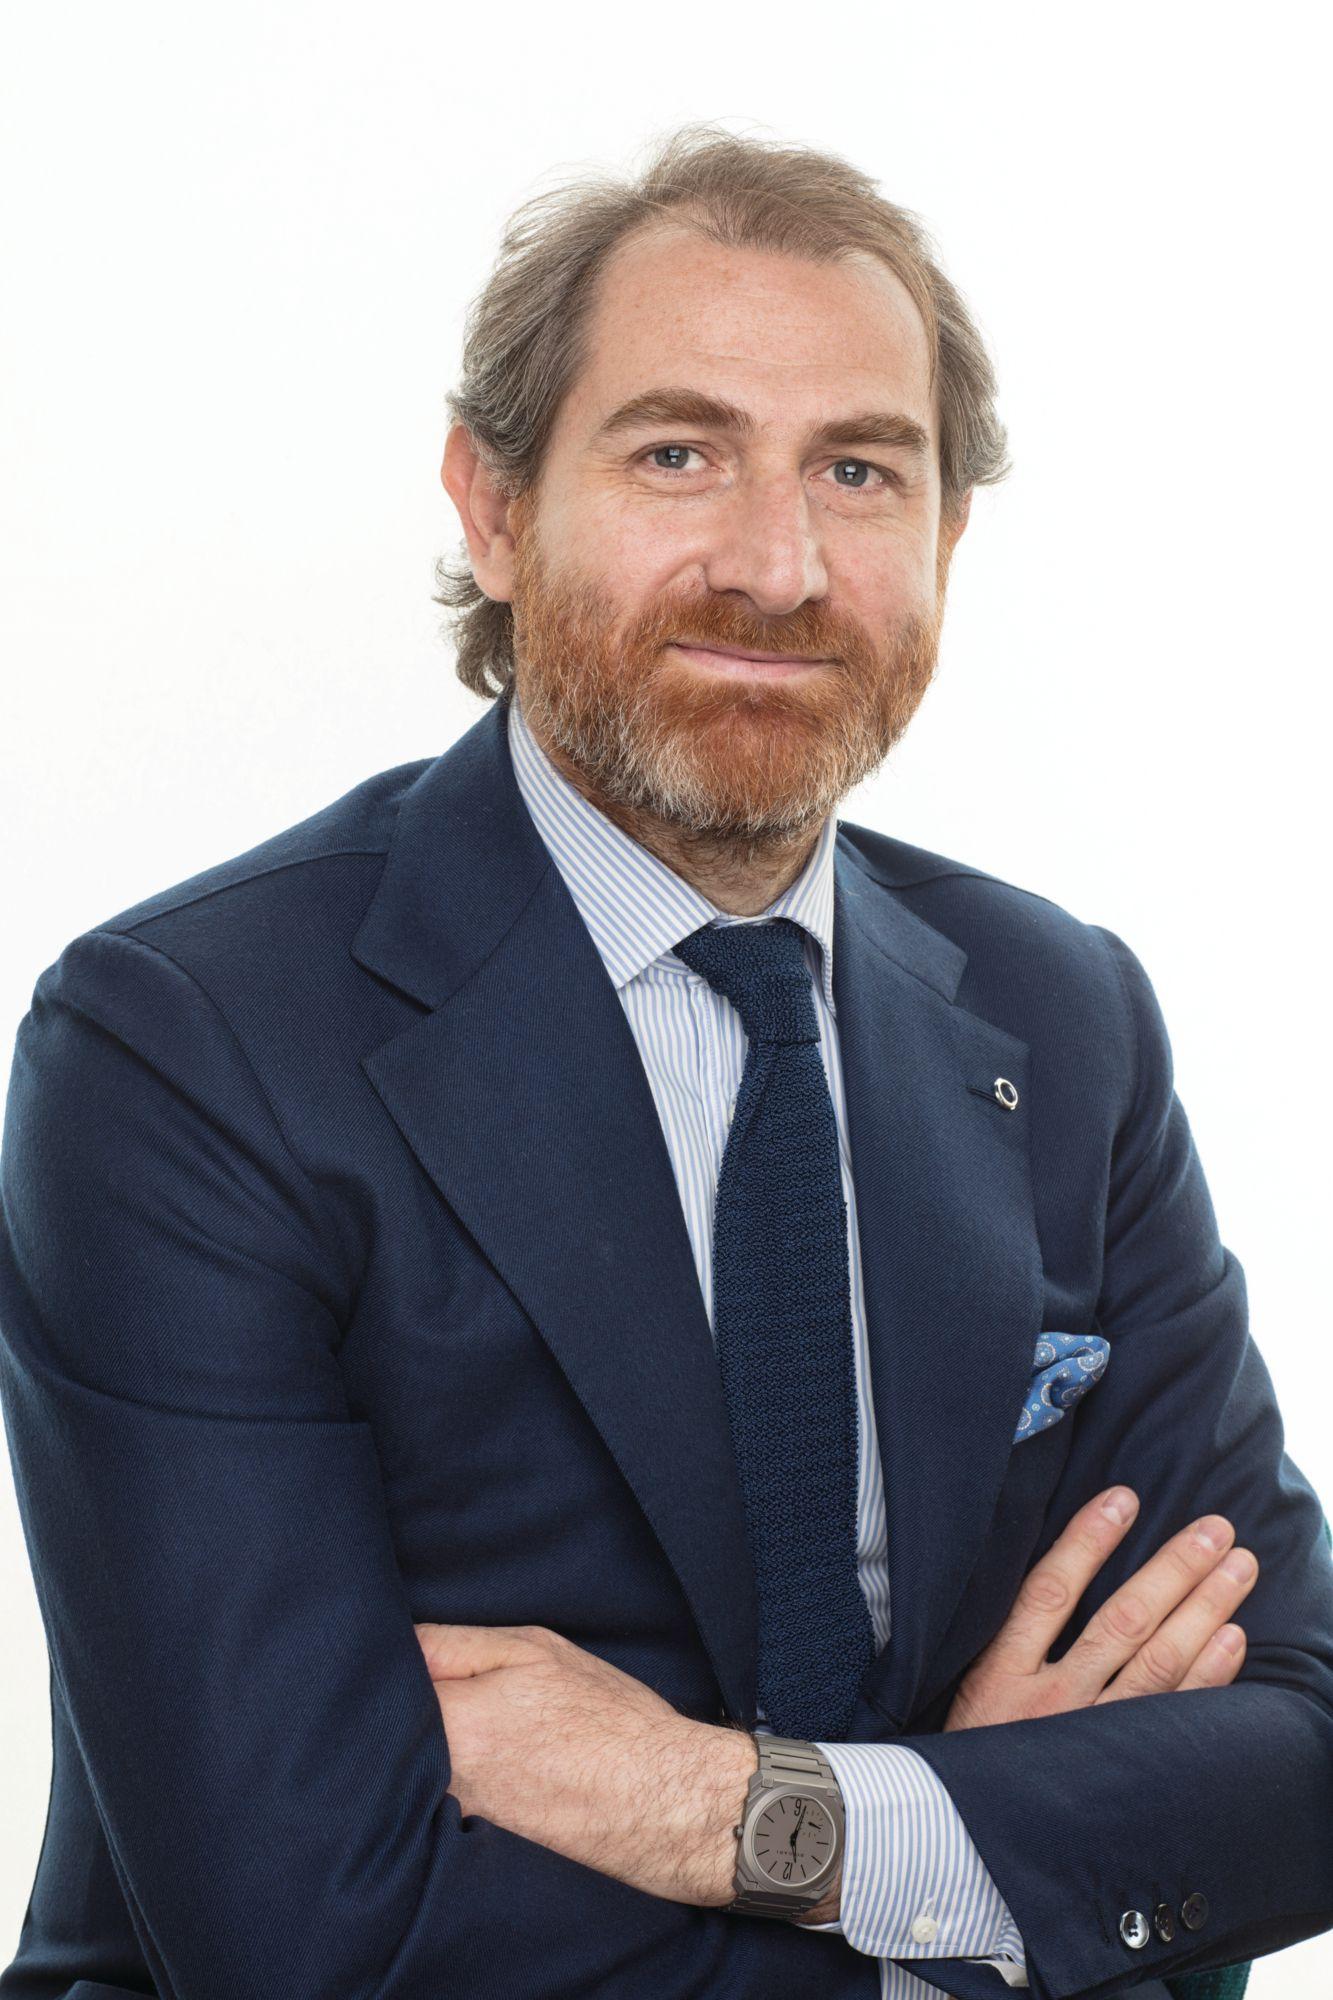 Chief Watch Designer Fabrizio Buonamassa Stigliani On His Favourite Bulgari Watch